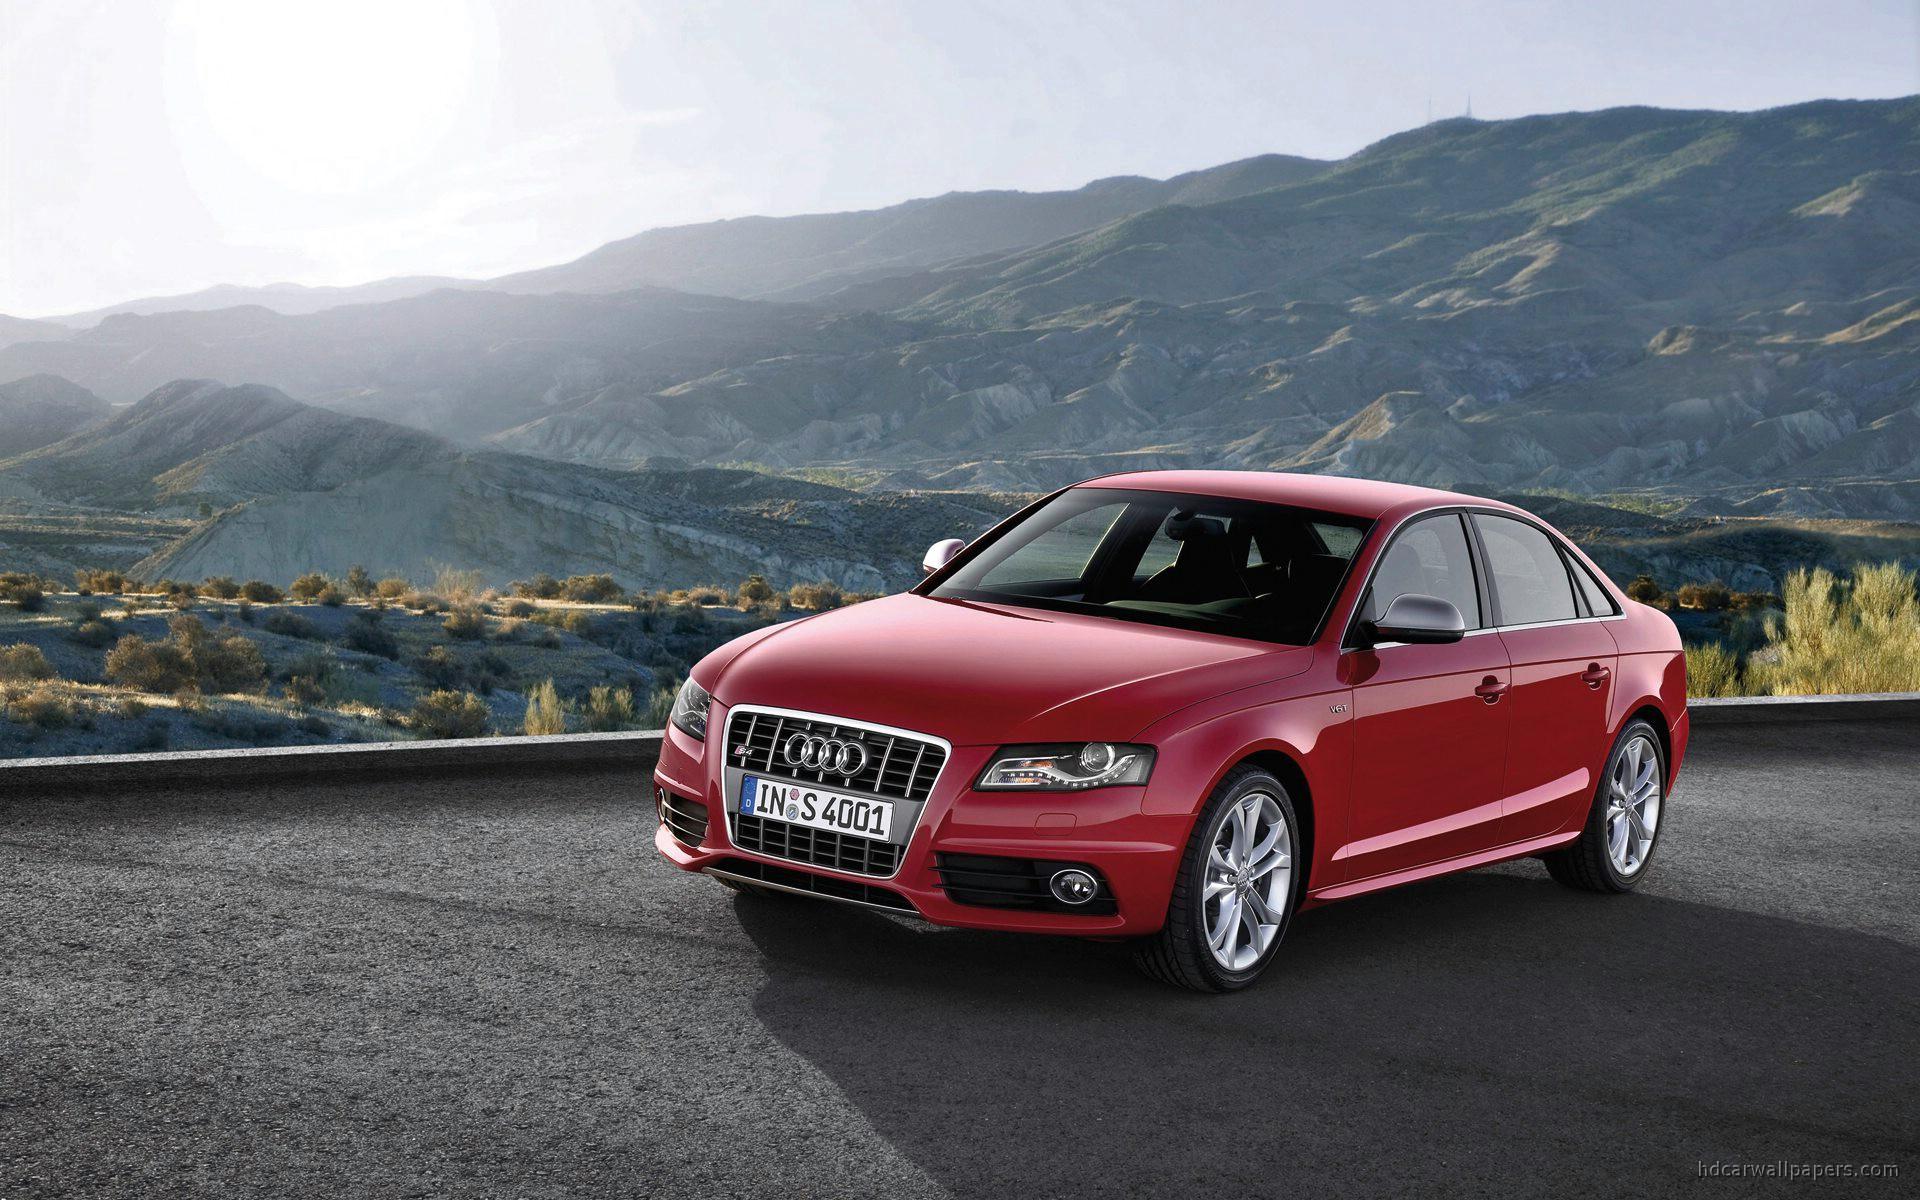 2009 Audi S4 Wallpaper HD Car Wallpapers 1920x1200